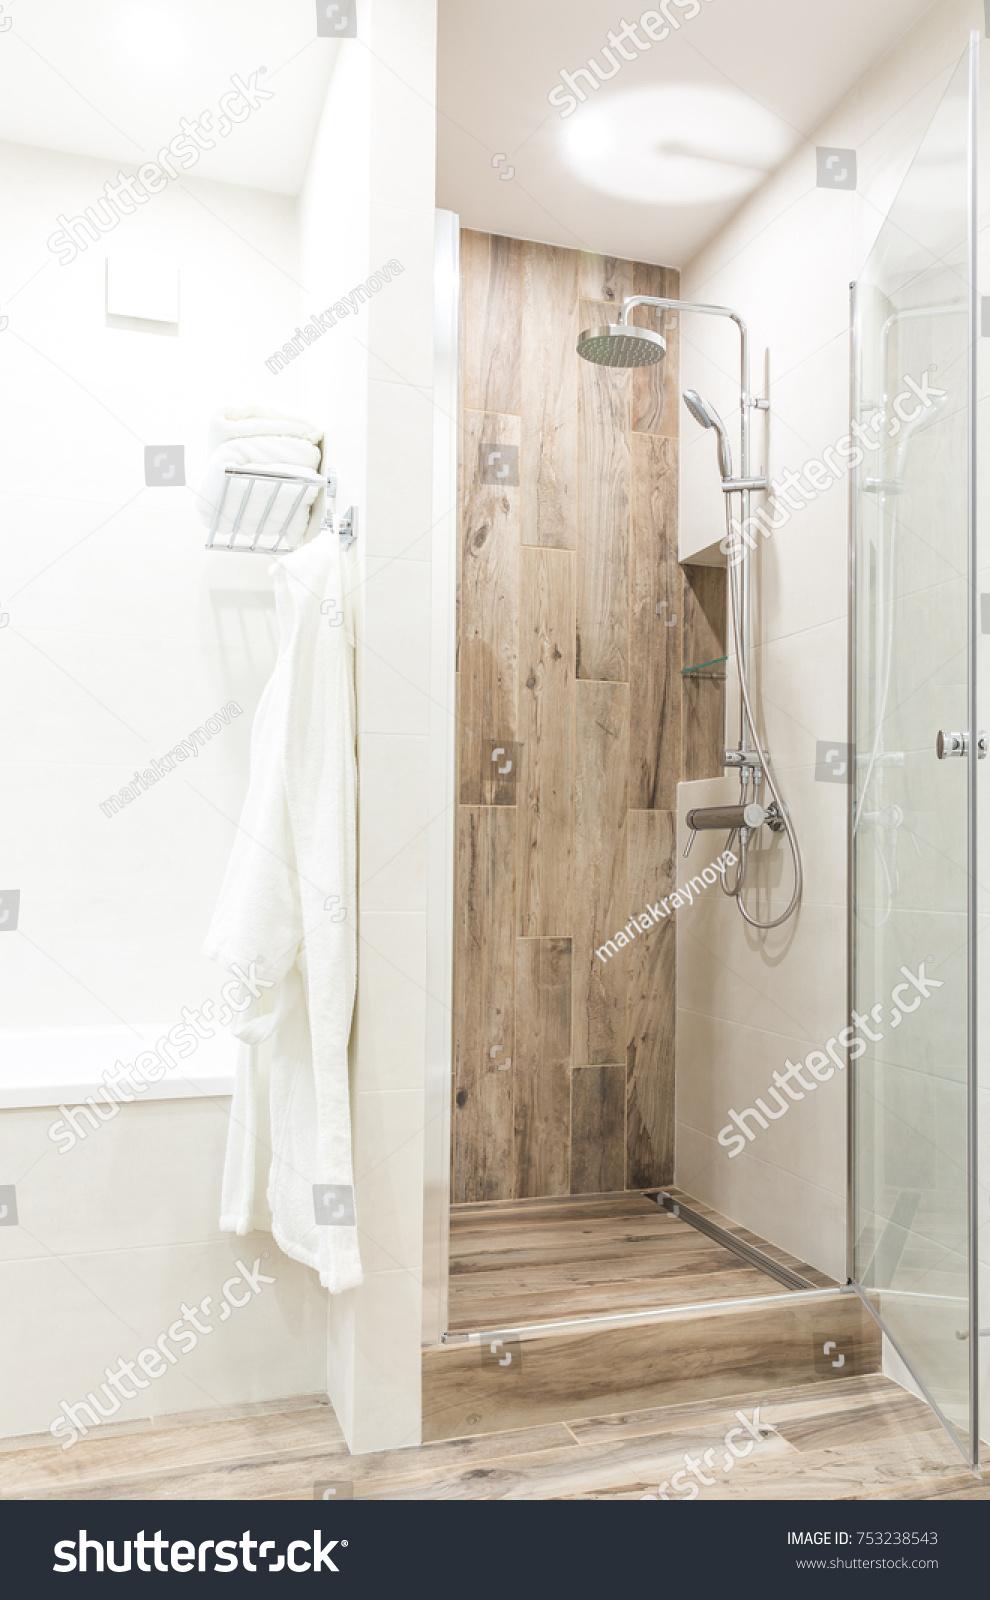 Walk Shower Bathroom Wooden Style Tile Stock Photo (Royalty Free ...